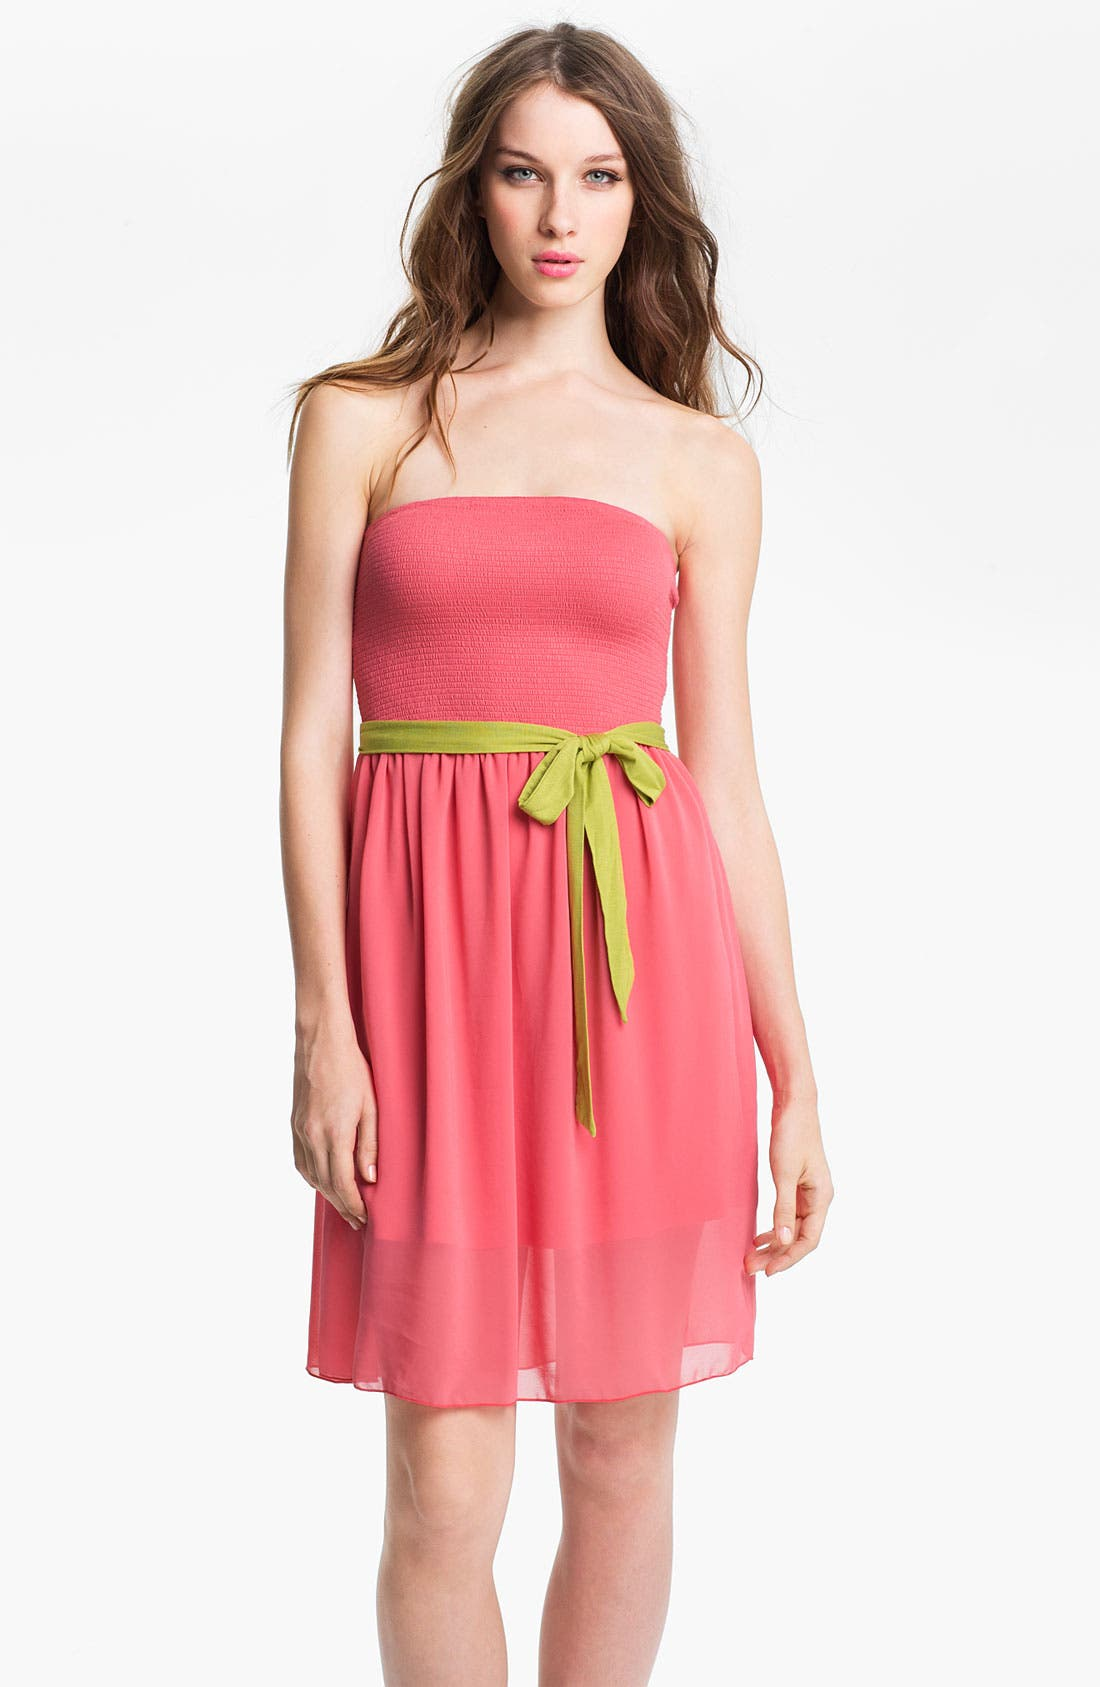 Alternate Image 1 Selected - Kensie Belted Strapless Dress